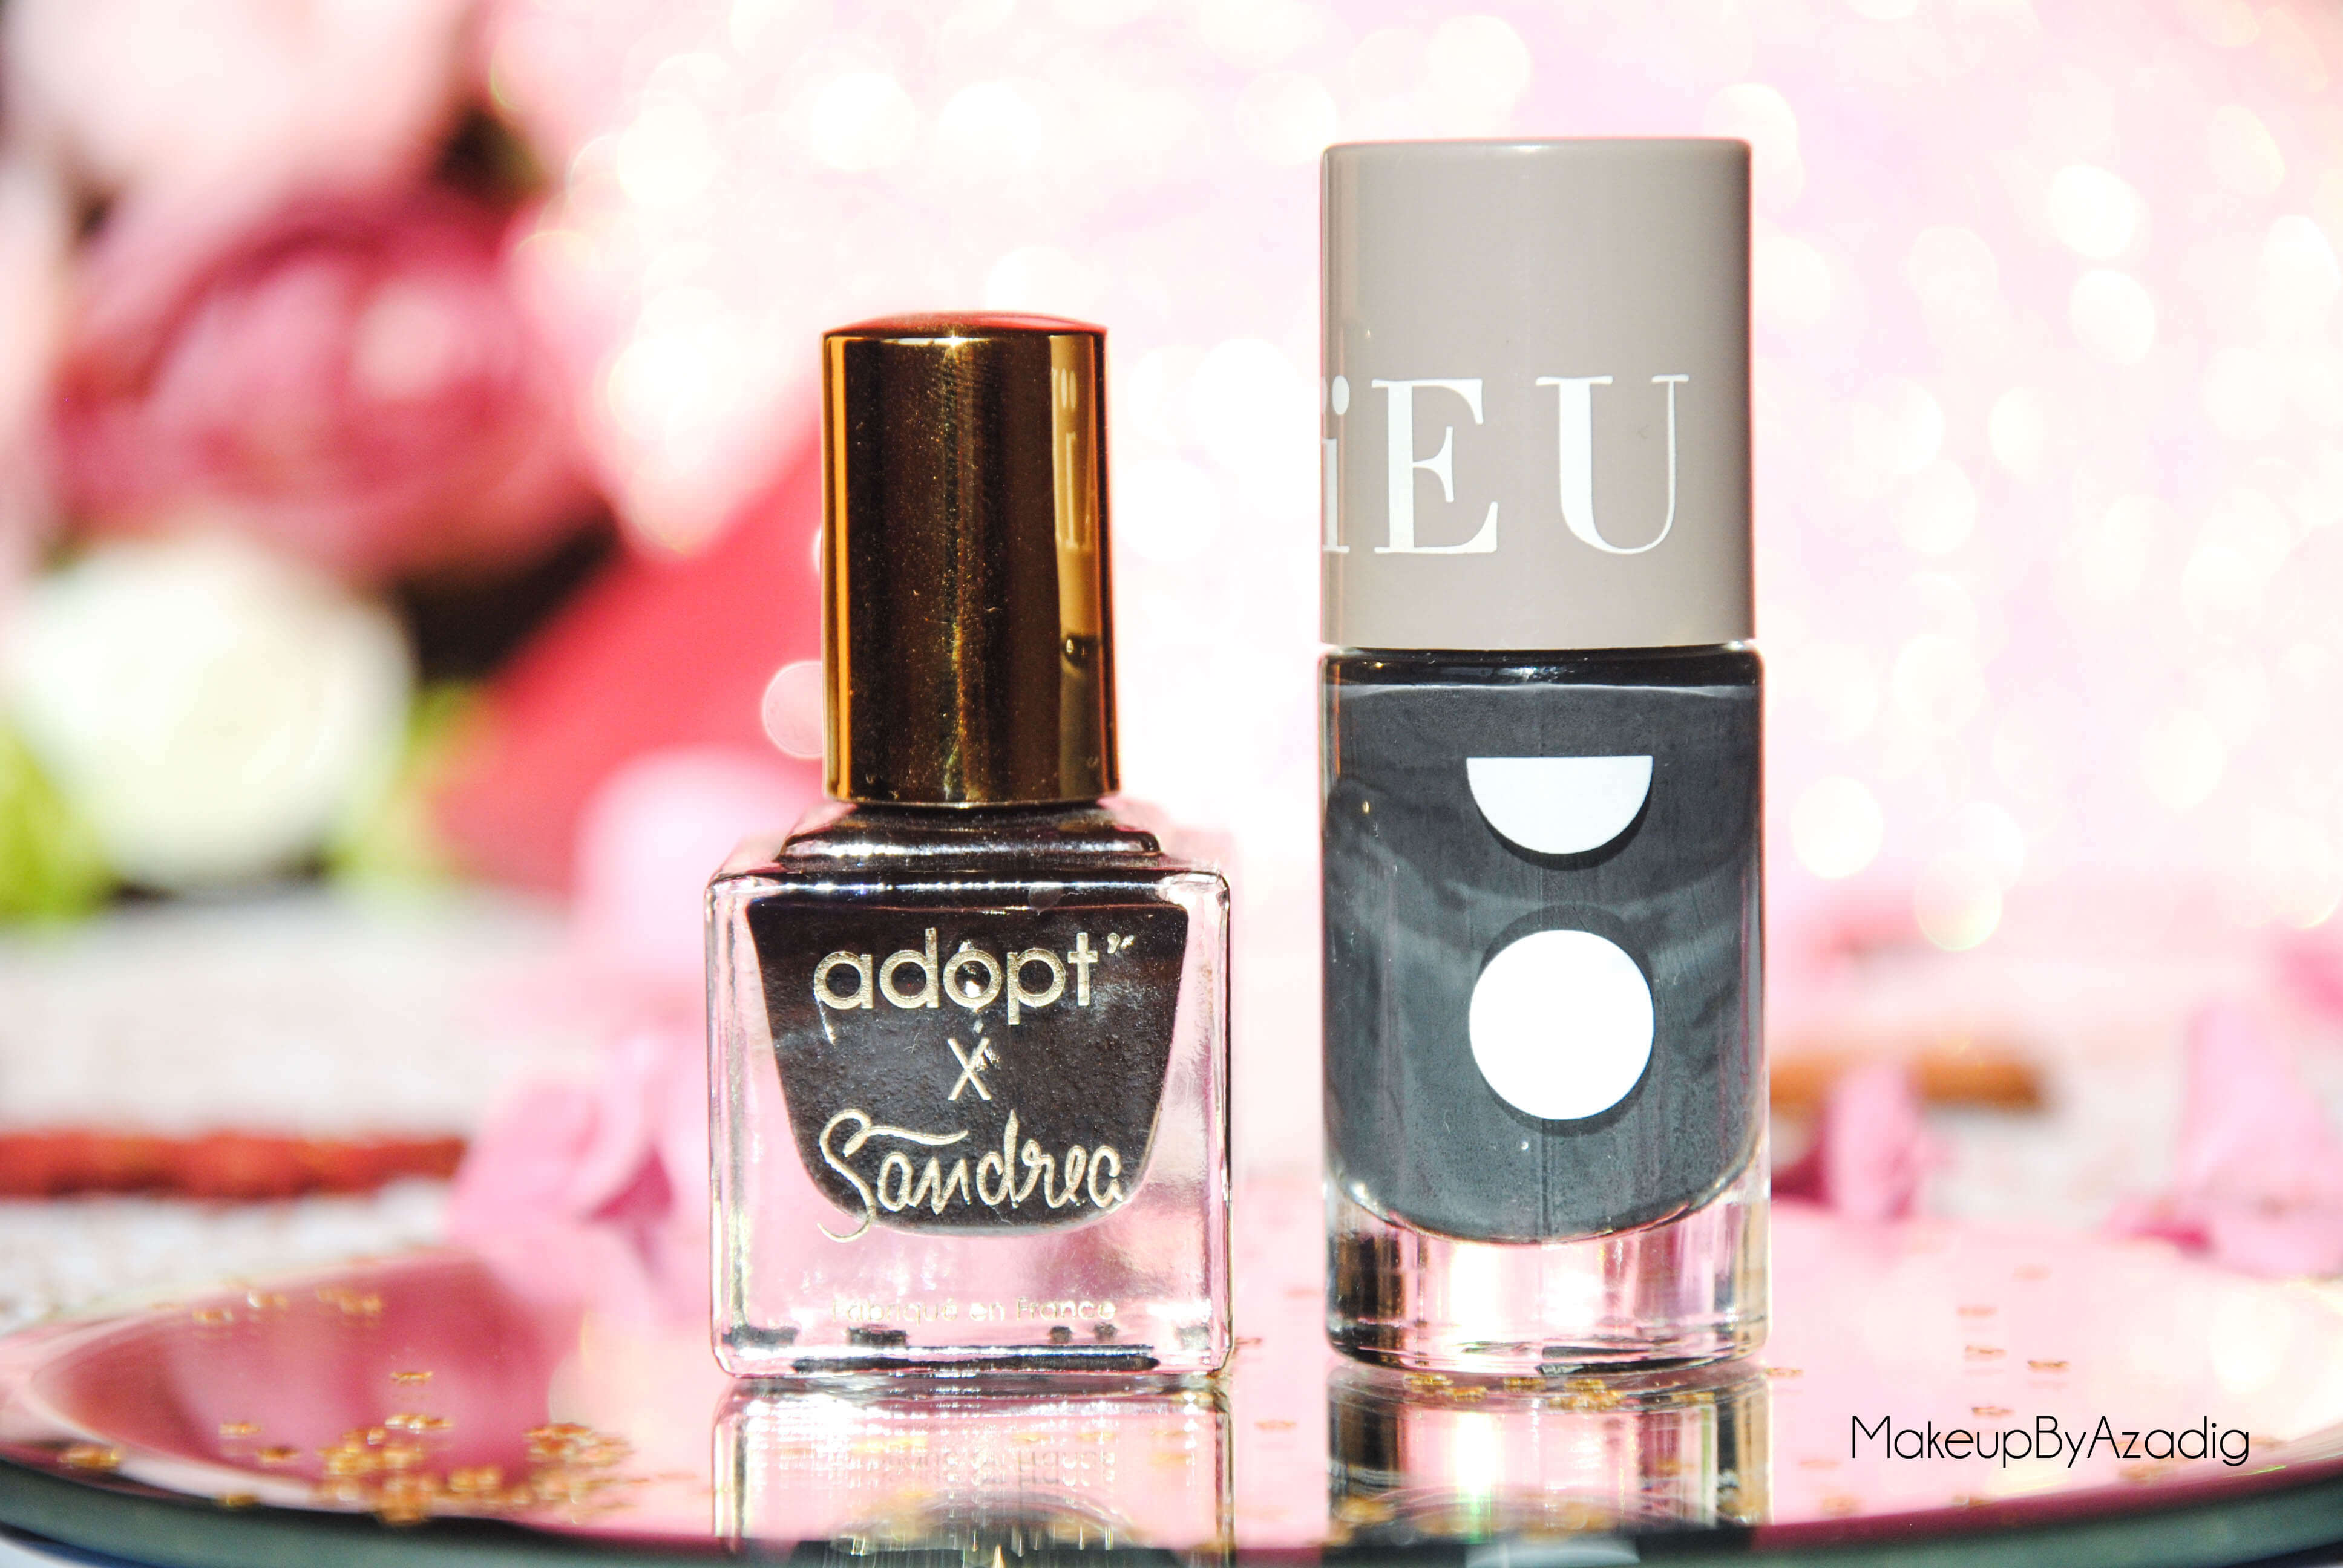 makeupbyazadig-vernis-tendance-automne-nails-autumn-formula-x-monop-makeup-troyes-dijon-paris-sandrea26france-camaieu-opi-kiko-sephora-mavala-essie-black